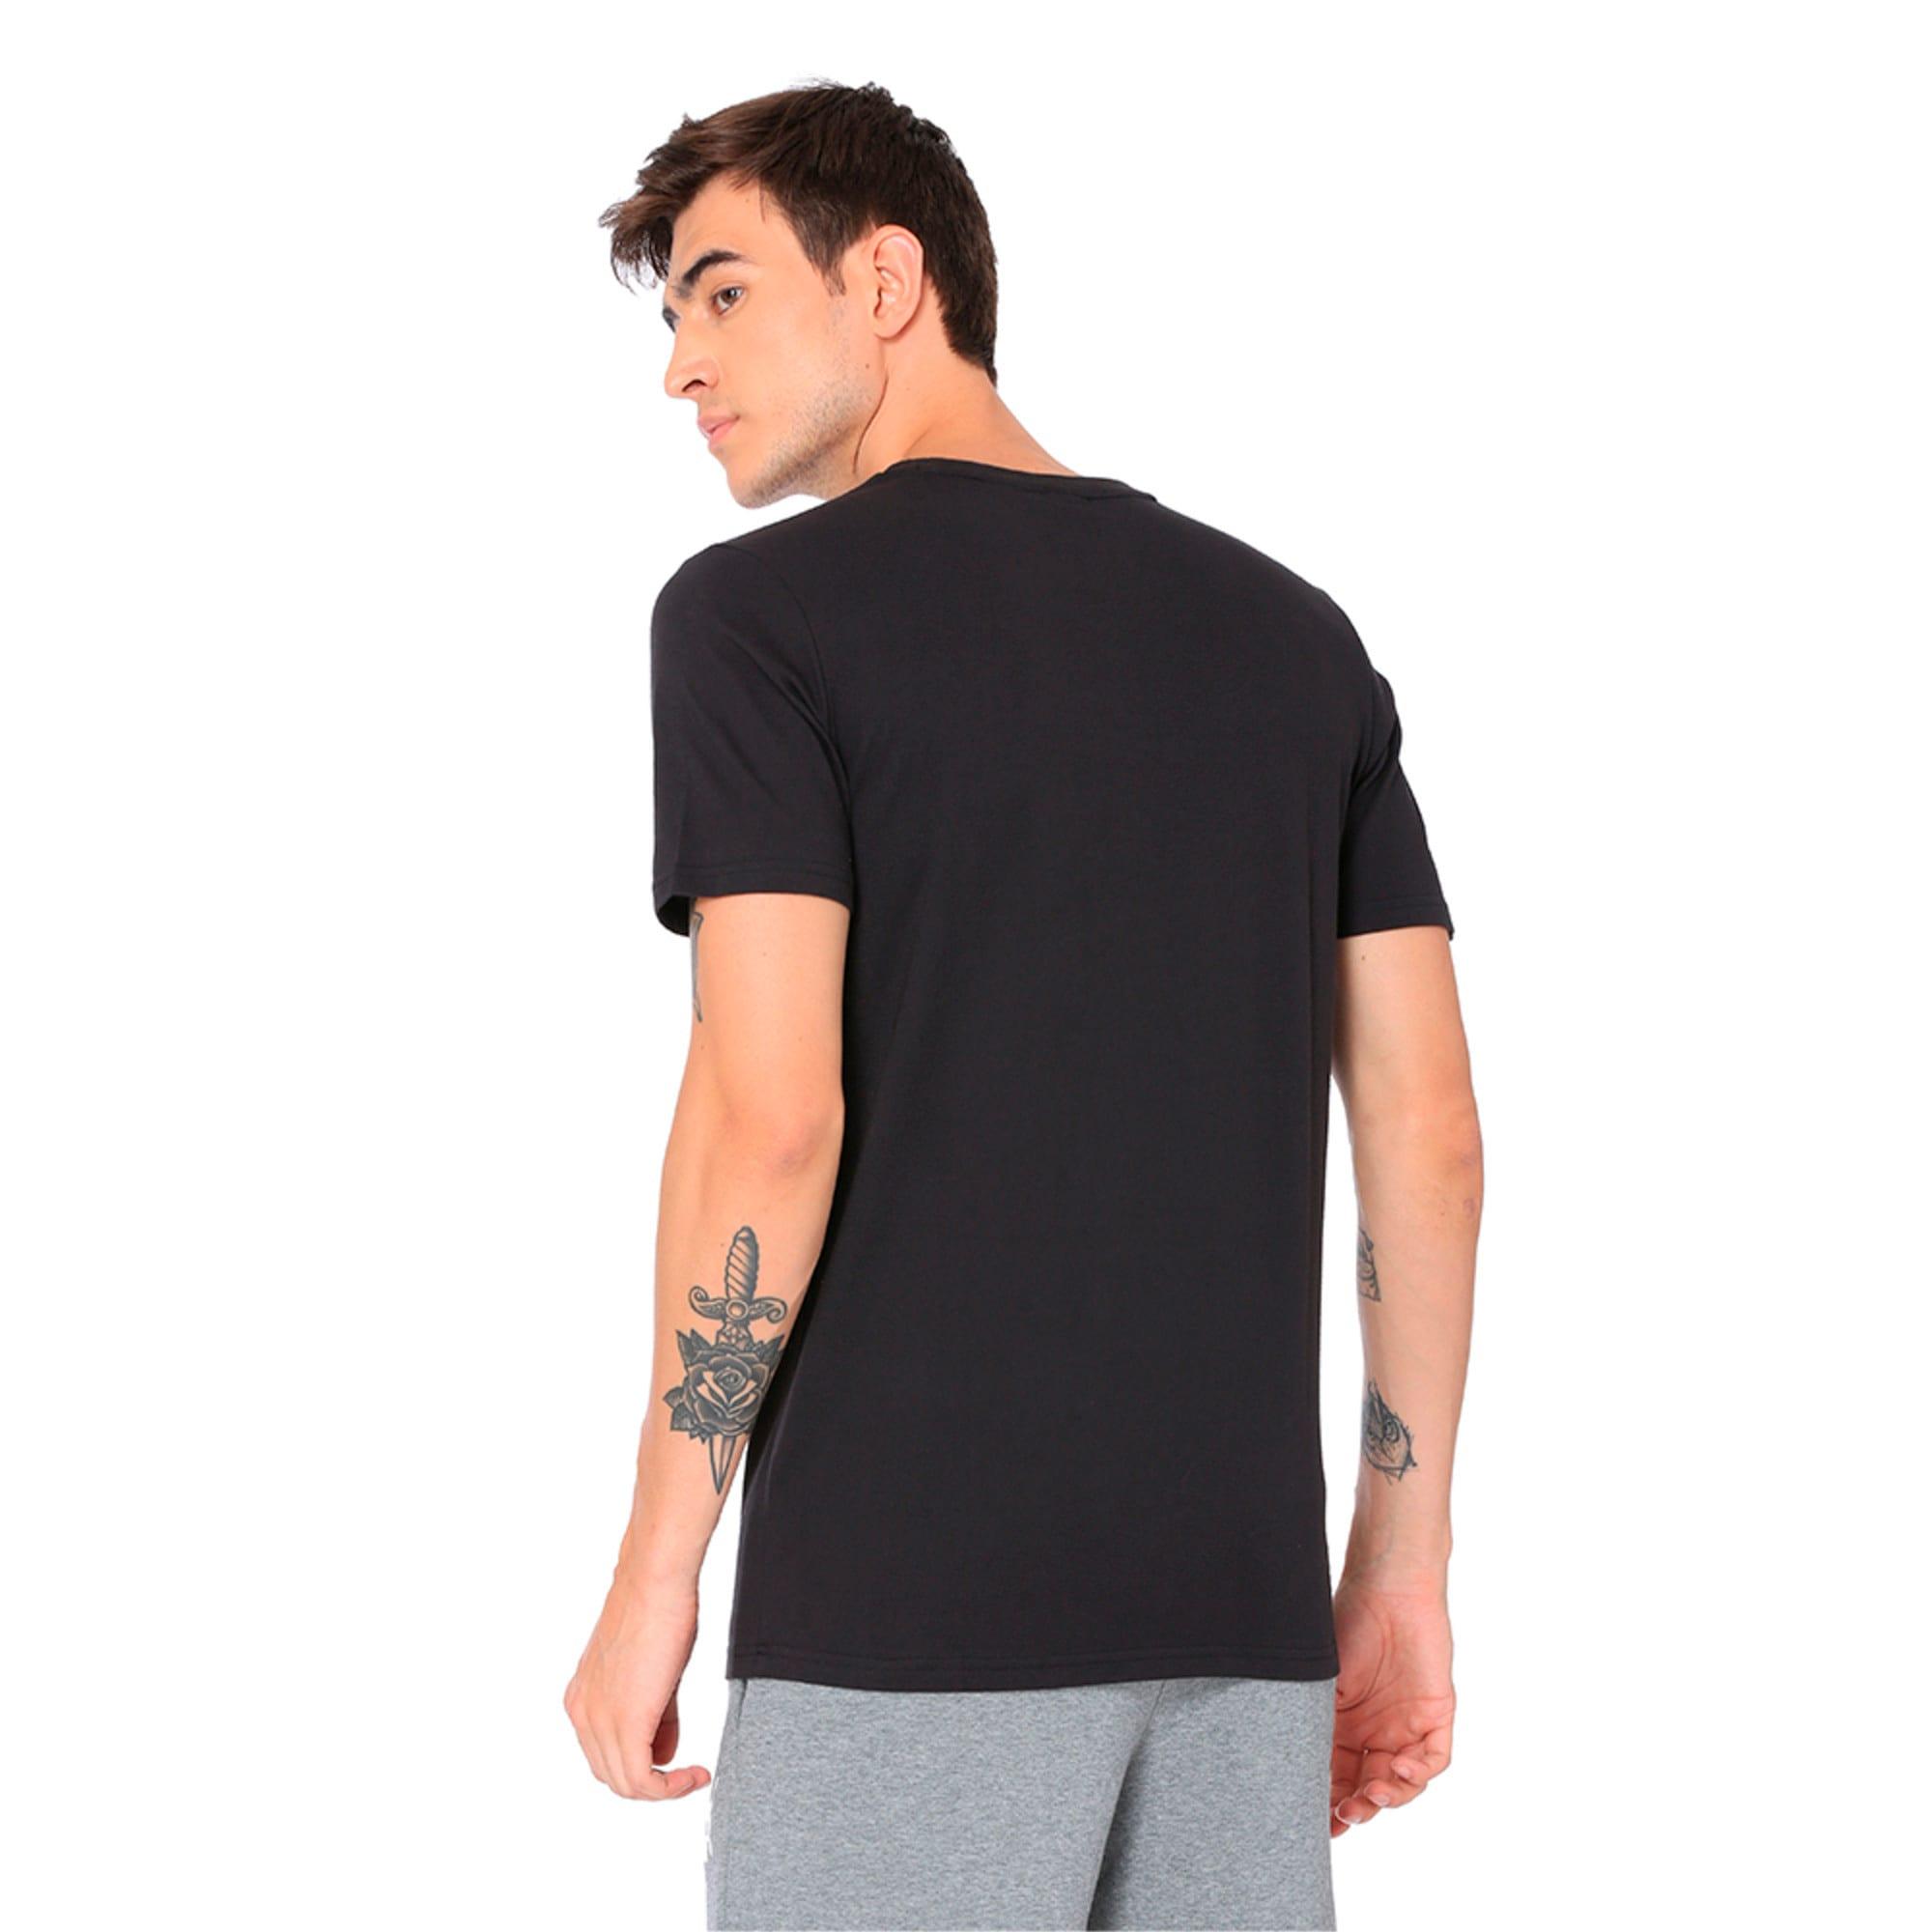 Thumbnail 5 of Classics Men's Archive Embossed Logo T-Shirt, Puma Black, medium-IND